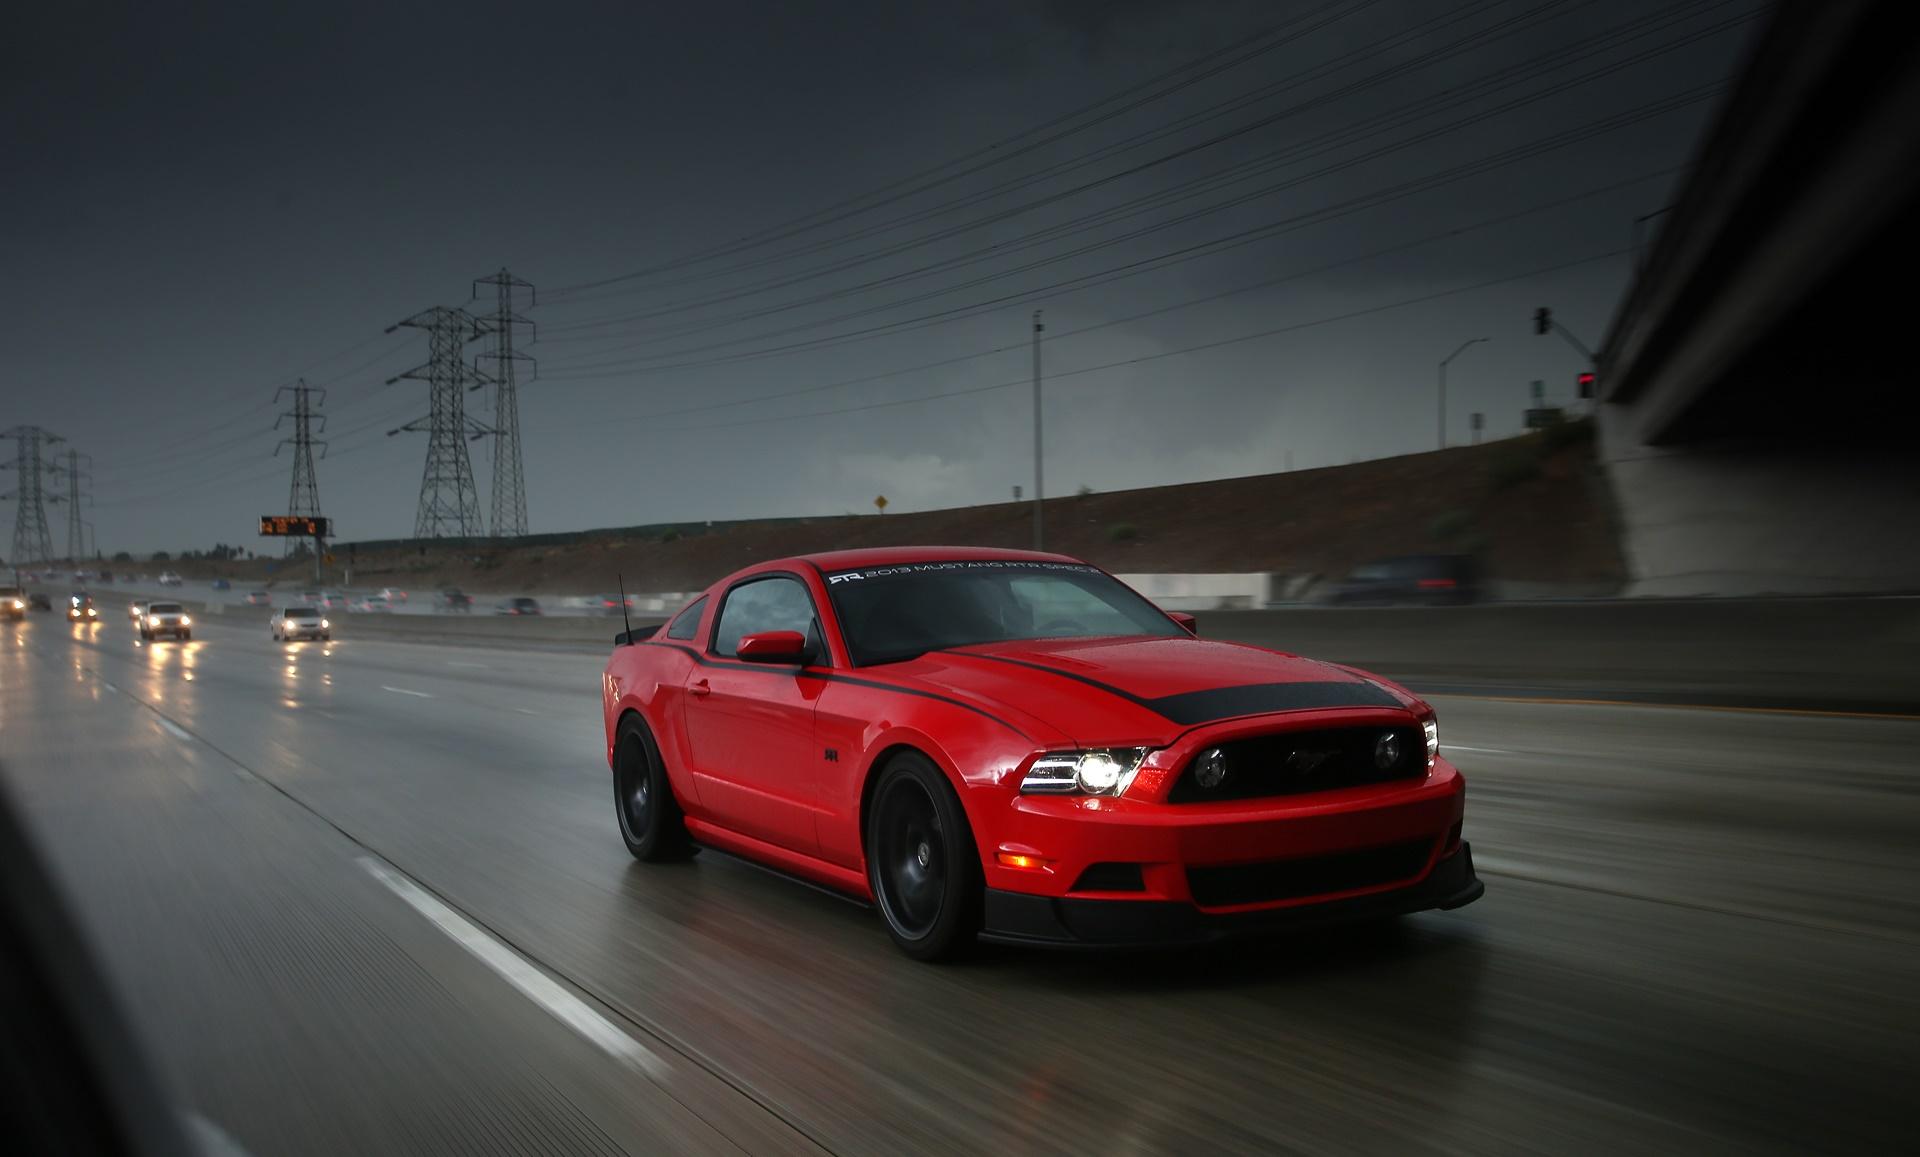 Wonderful Wallpaper High Quality Mustang - Ford-Mustang-Wallpaper-035  Photograph_519297.jpg